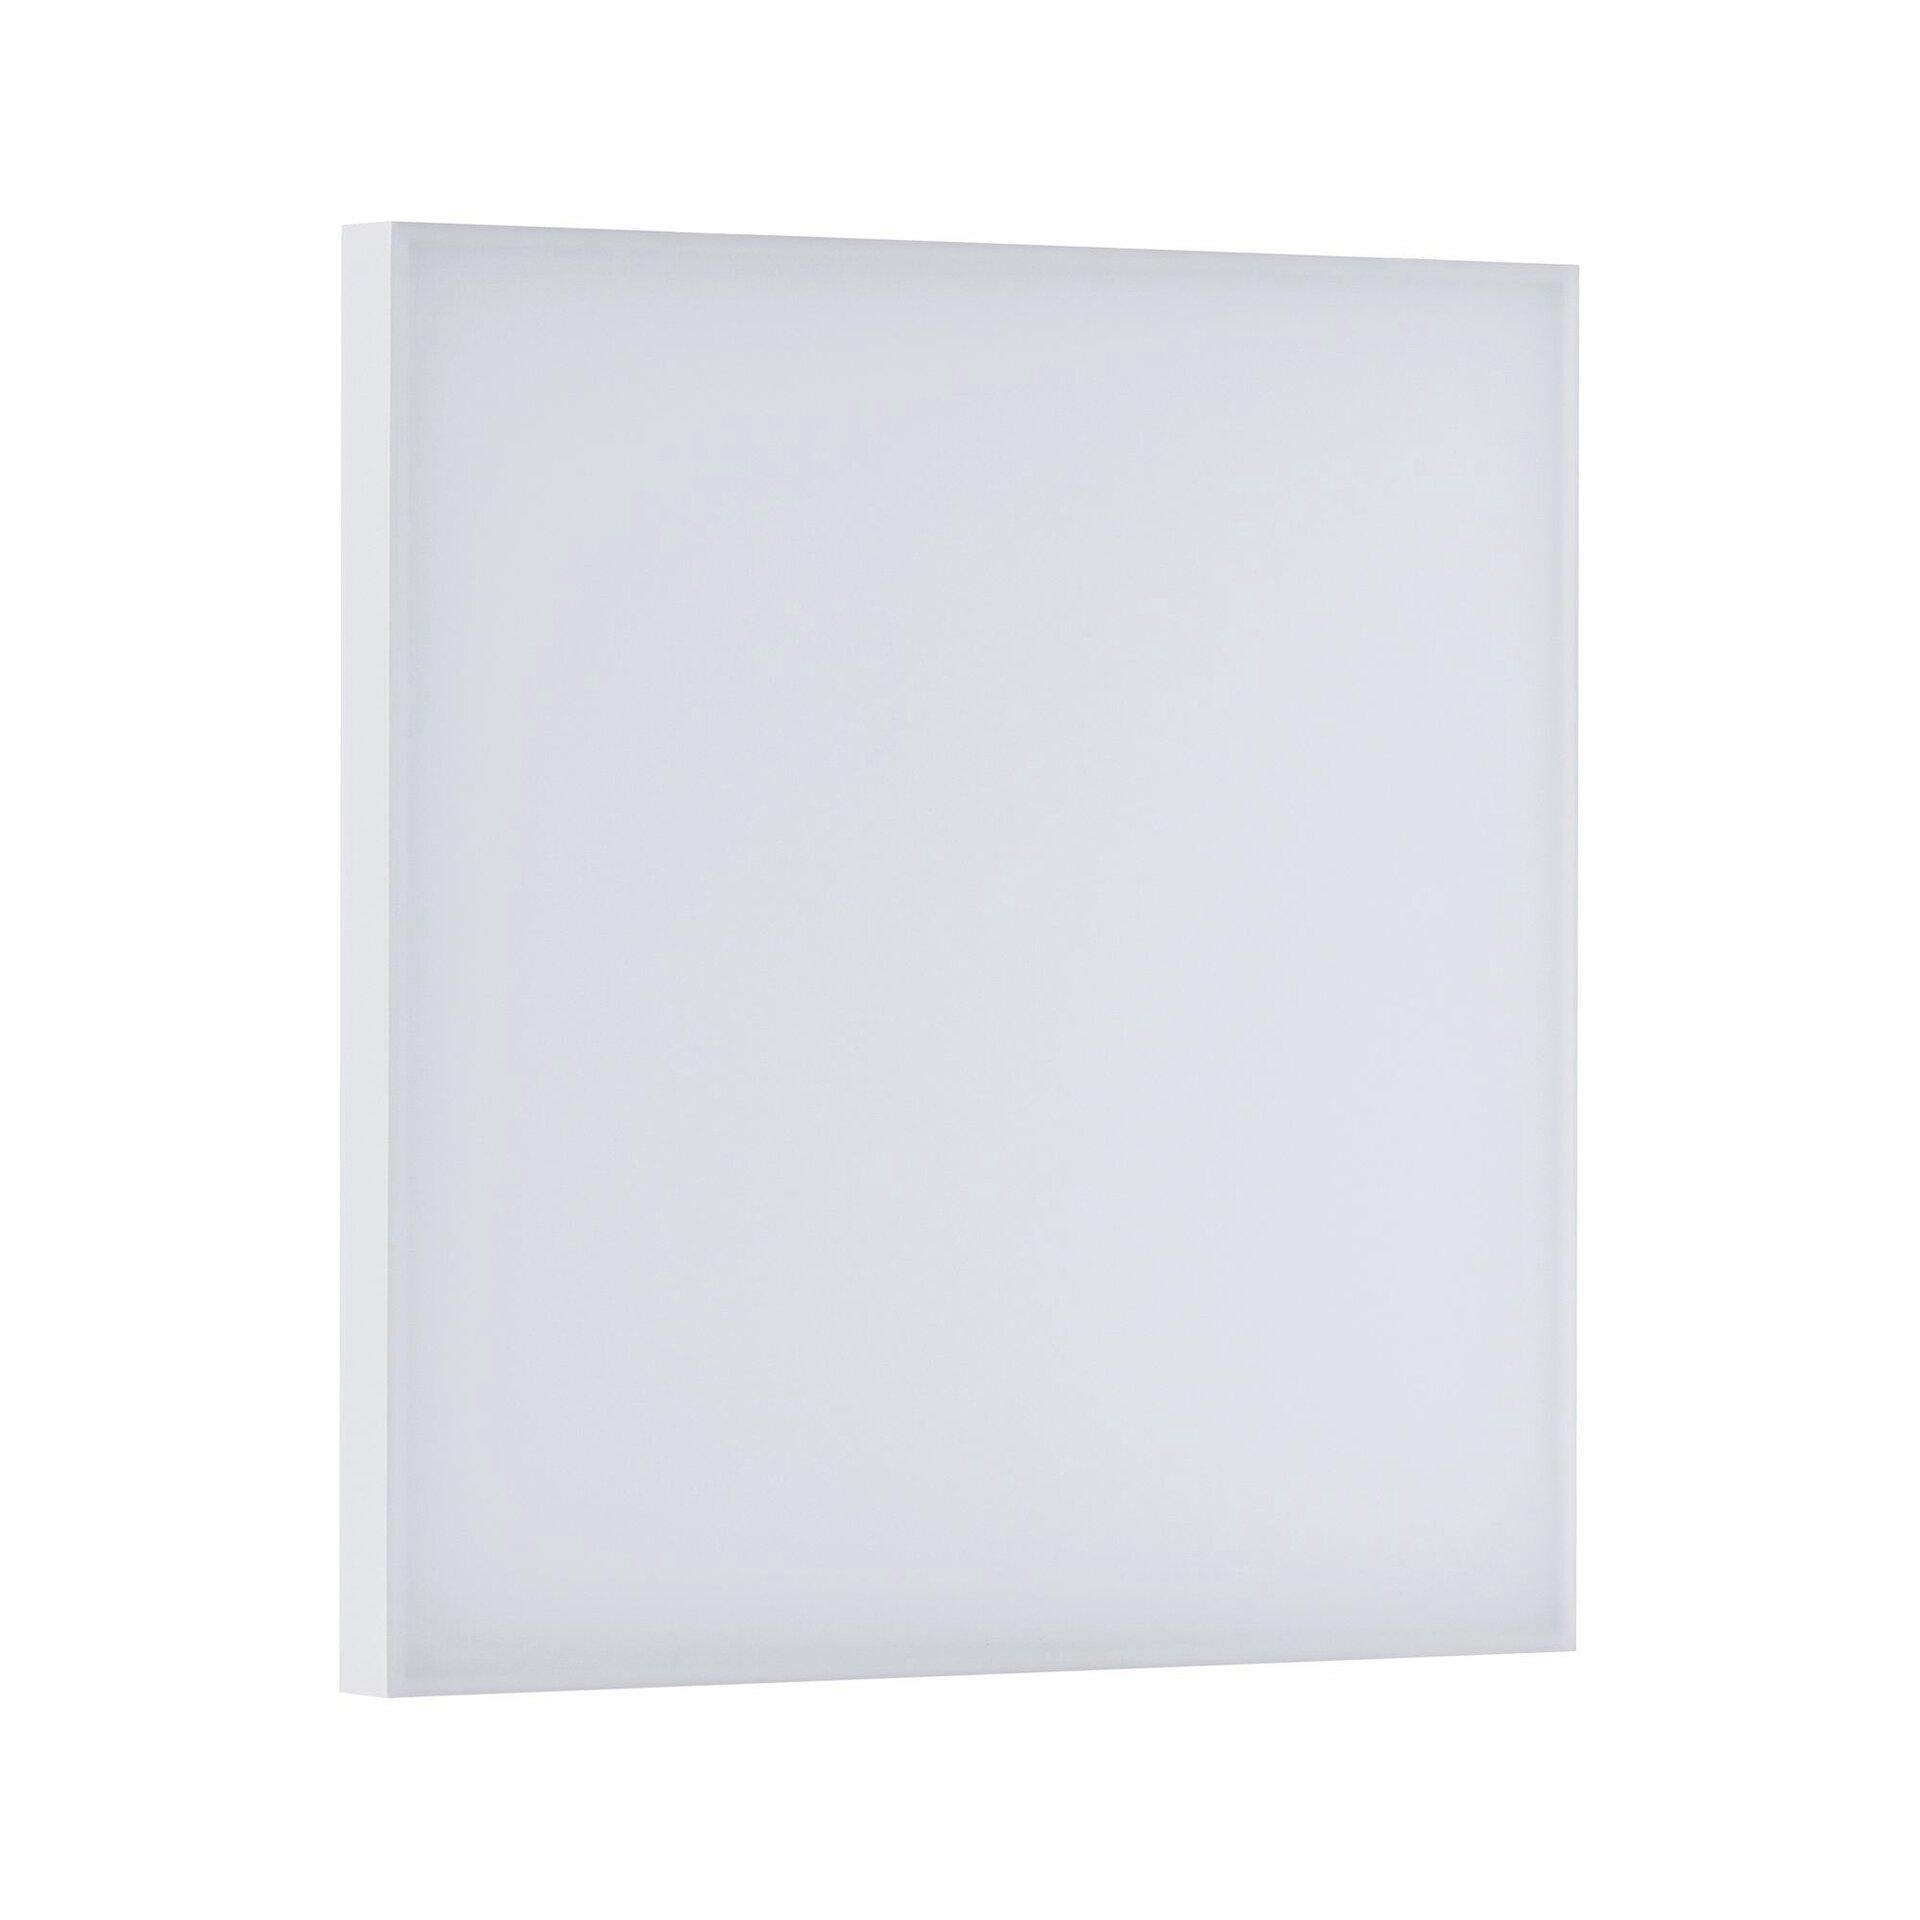 Panel Velora Paulmann Metall weiß 60 x 5 x 60 cm